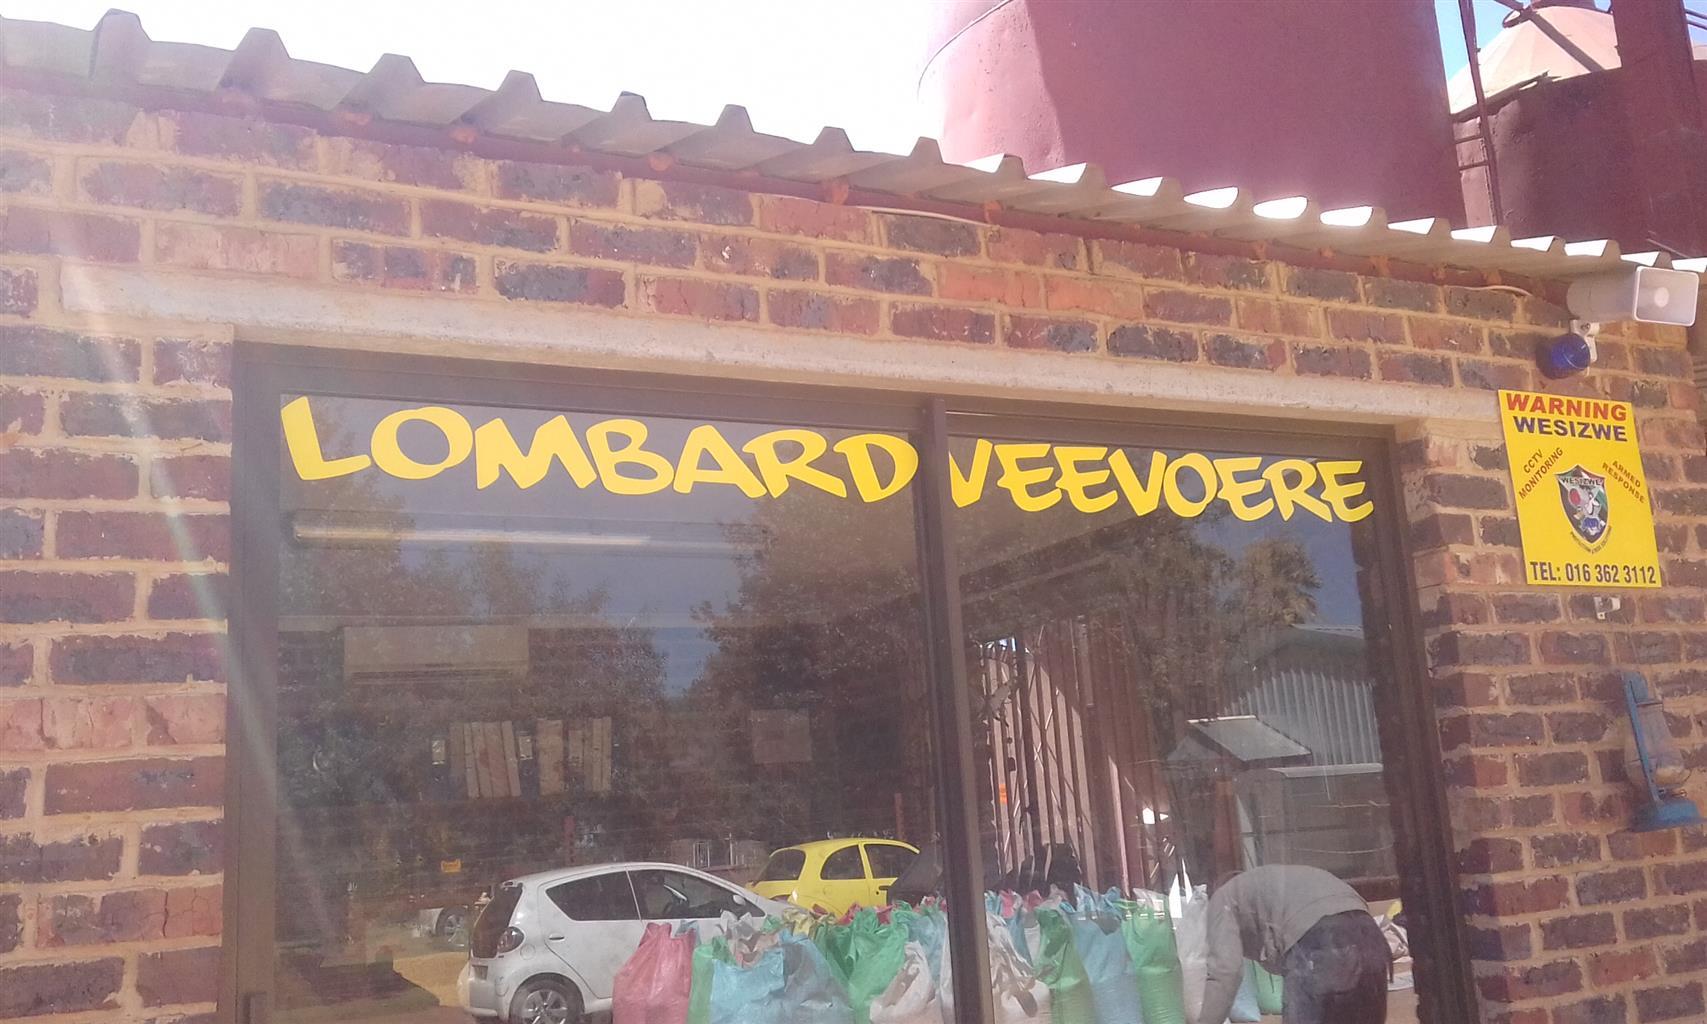 Lombard Veevoere